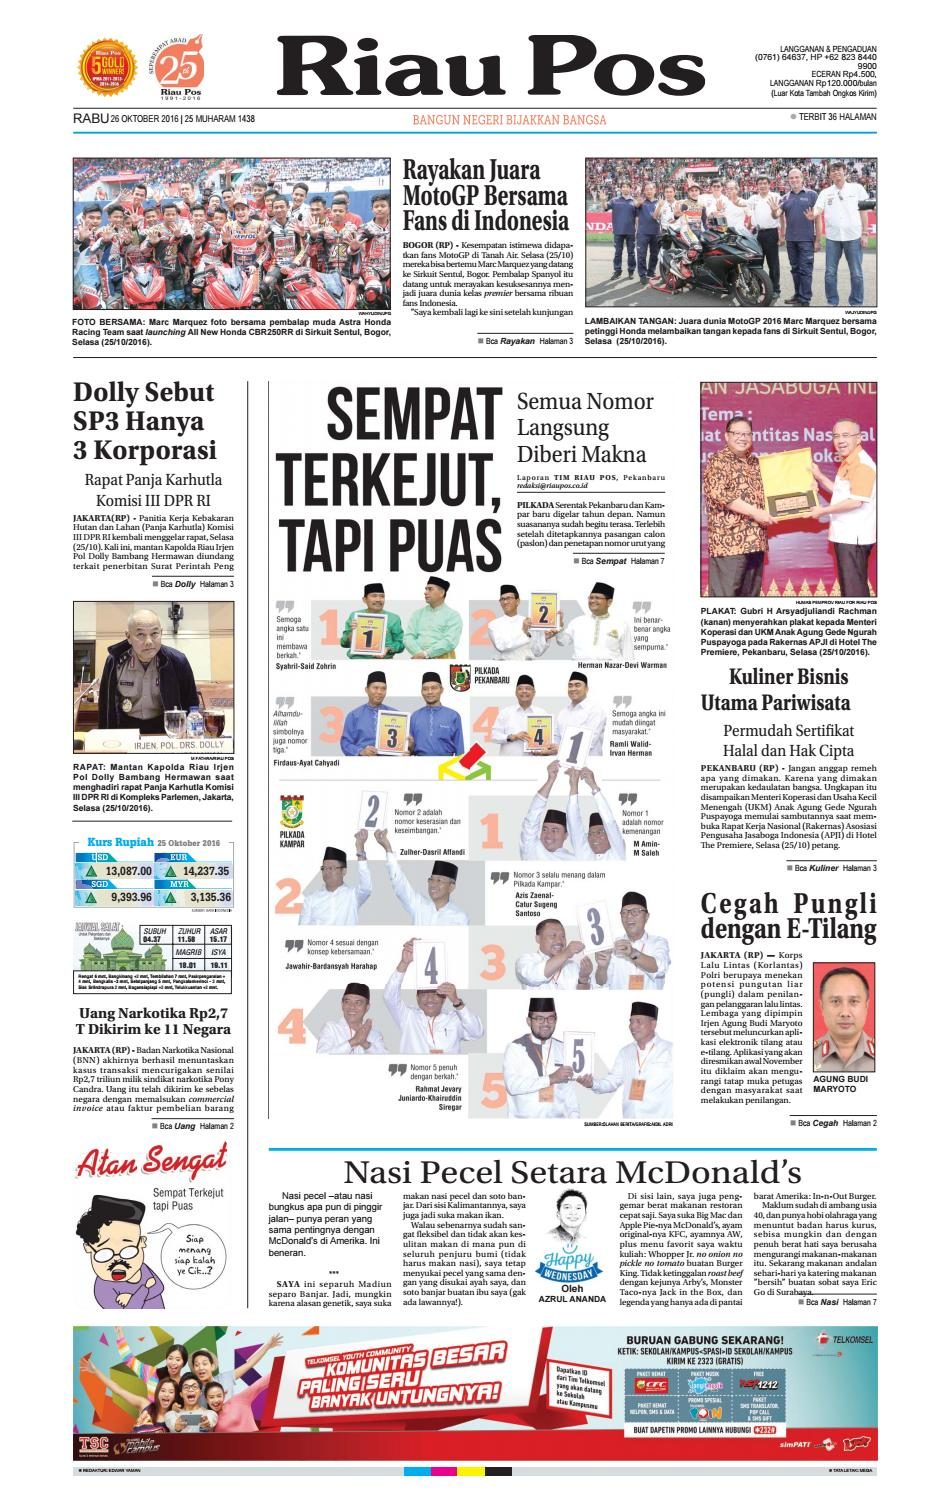 2016 10 26 By Riau Pos Issuu Produk Ukm Bumn Chesse Pie Khas Balikpapan